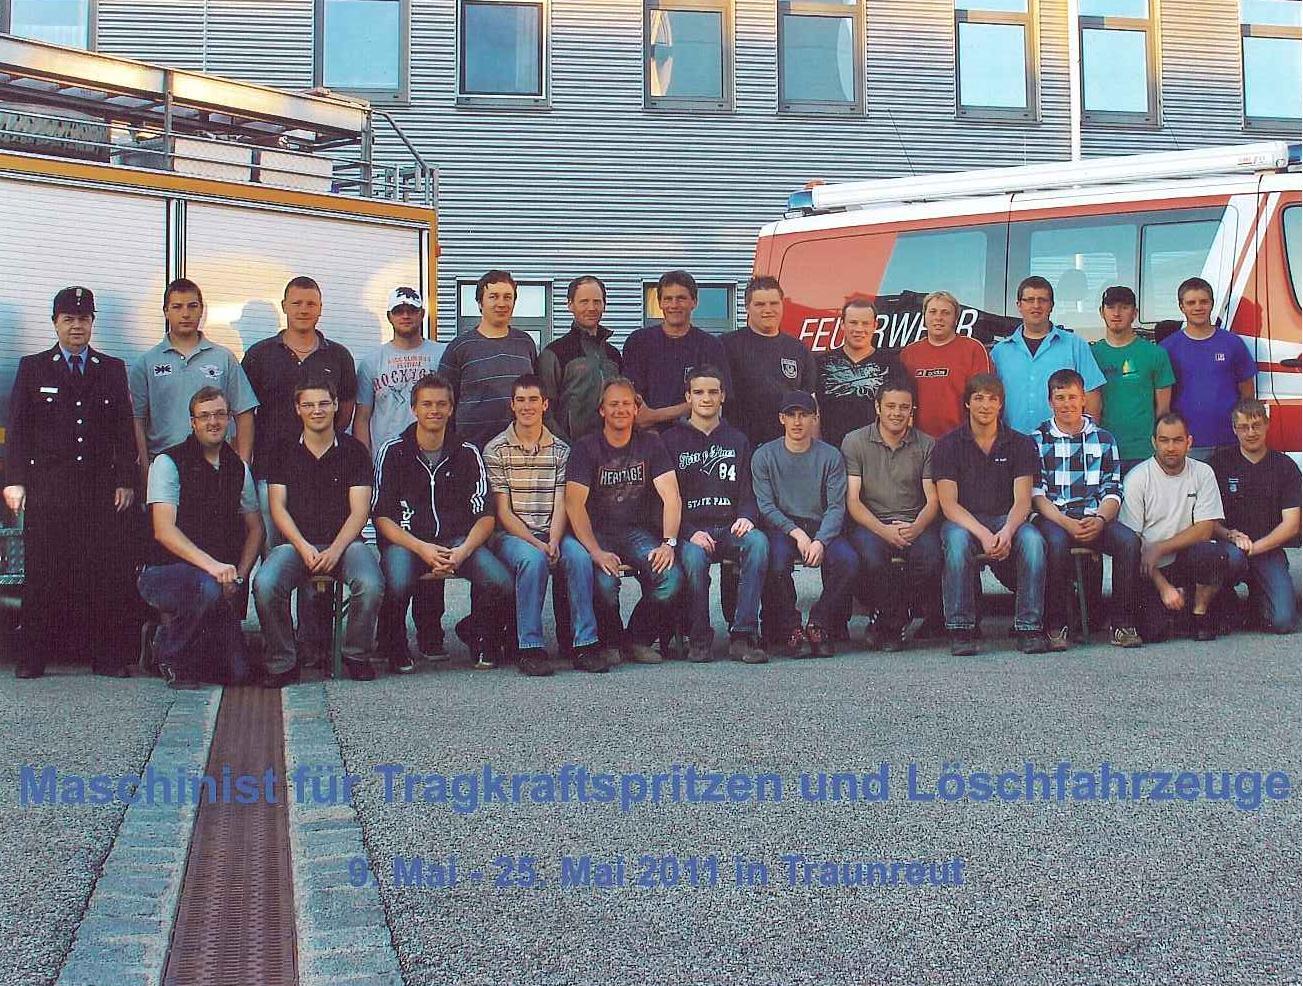 Maschinistenlehrgang Mai 2011 TS-11-MA-31